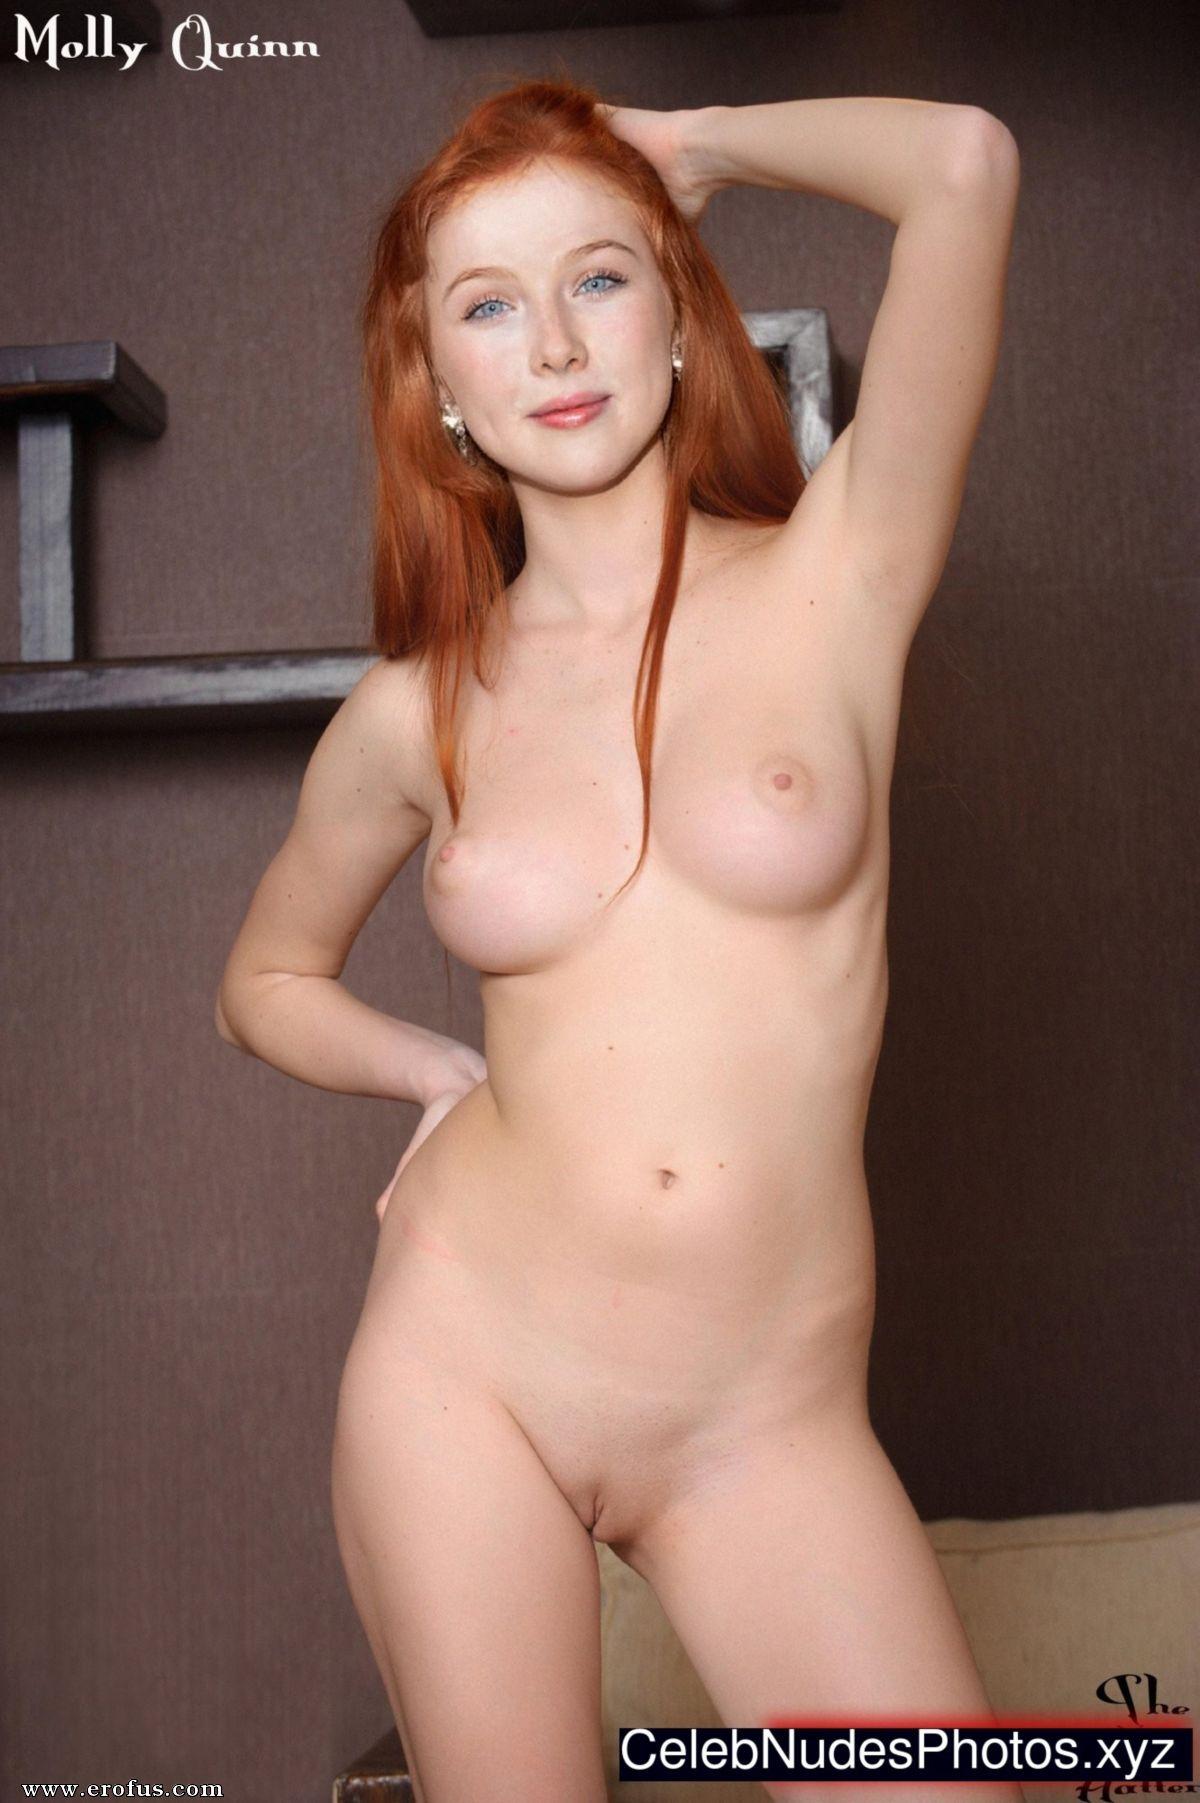 Molly quinn nude pics